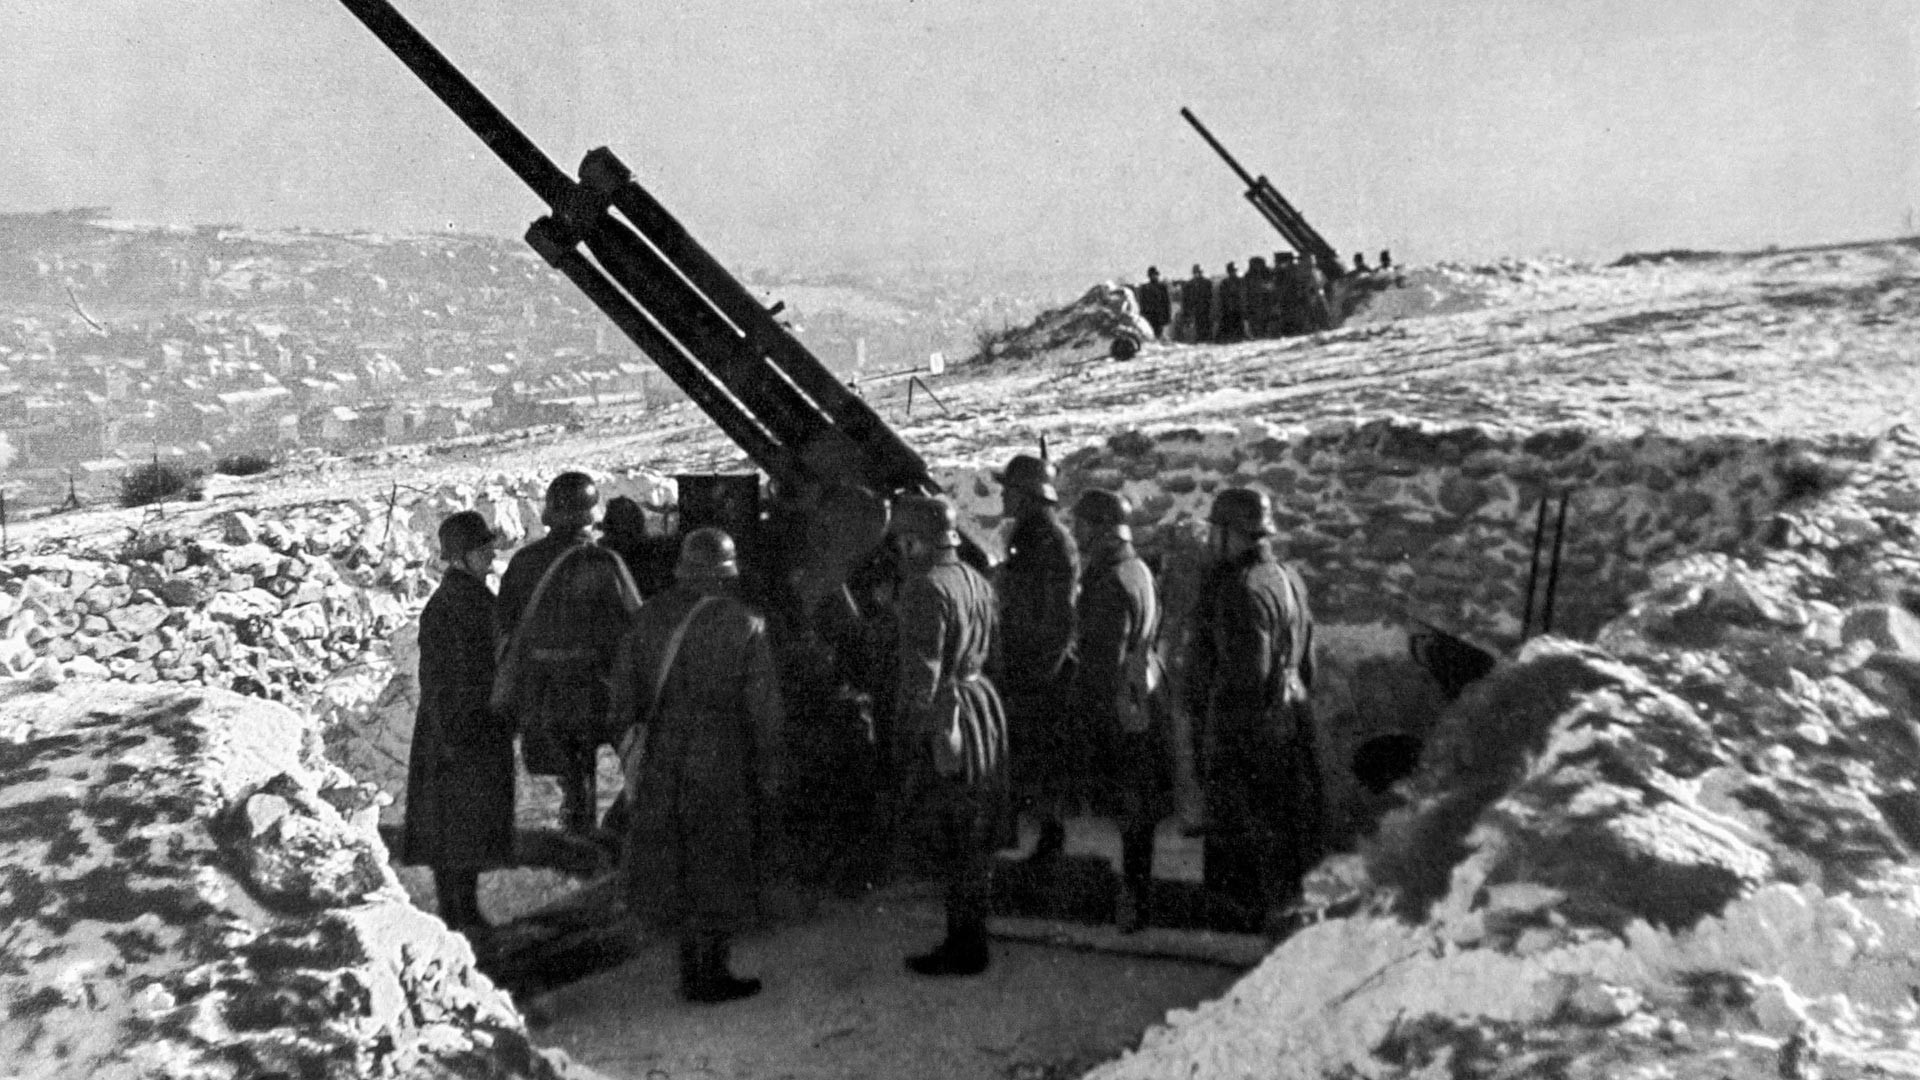 Унгария, 1941 г., Втората световна война, Унгарската армия, охраняваща Дунава, в сп.